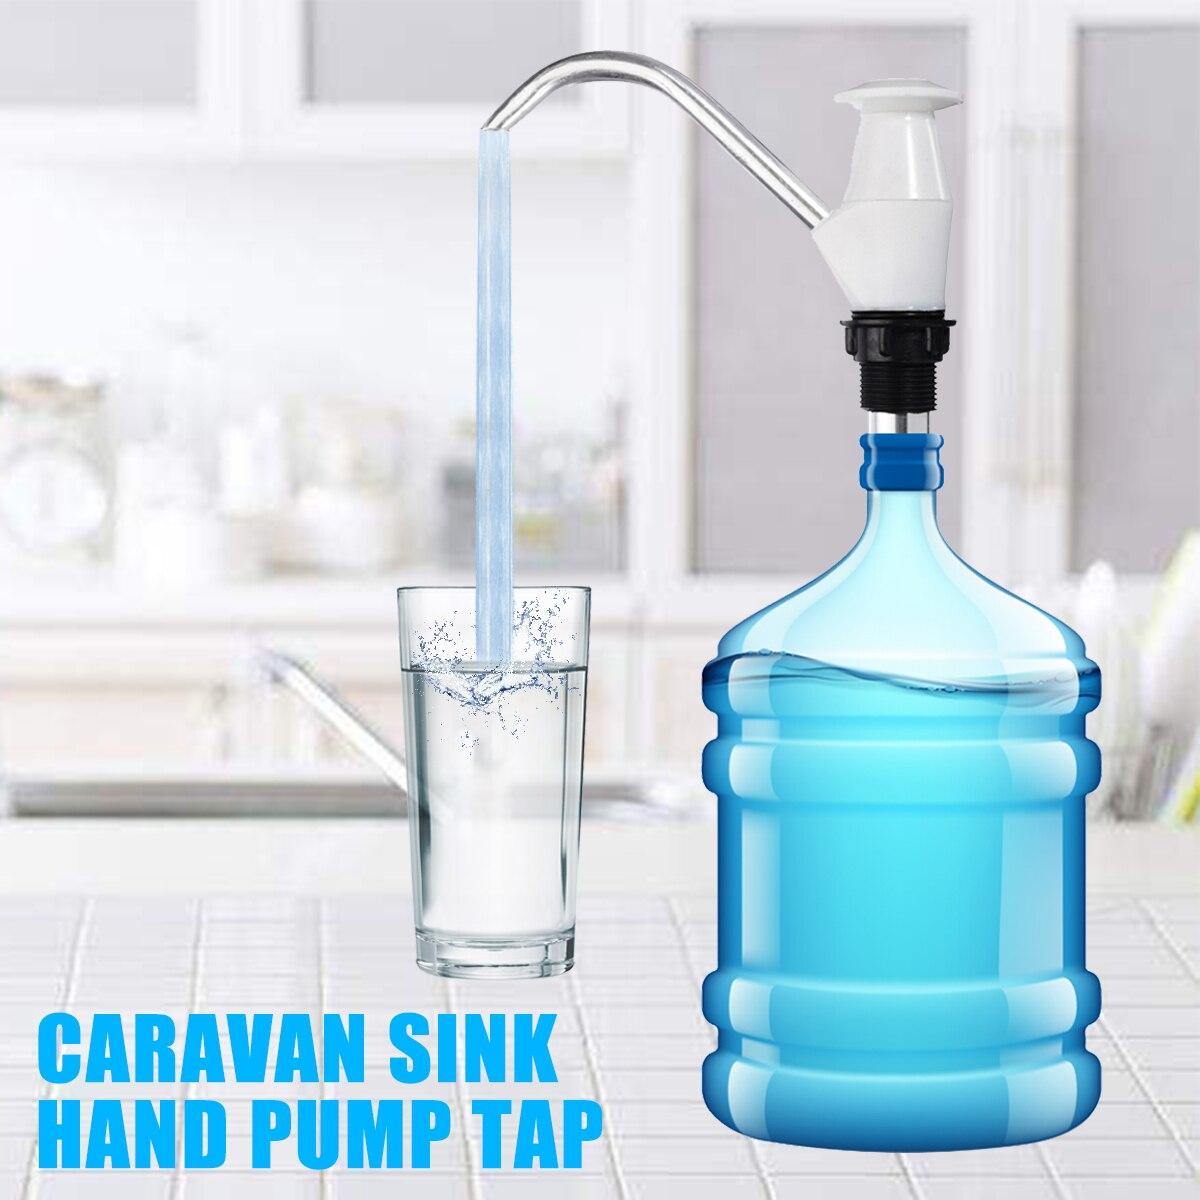 Mayitr Water Bottle Pump Tap Hand Manual Dispenser Drinking Sink Hand Pump for Trailer Caravan Motorhome 4wd Replace Sink Jug